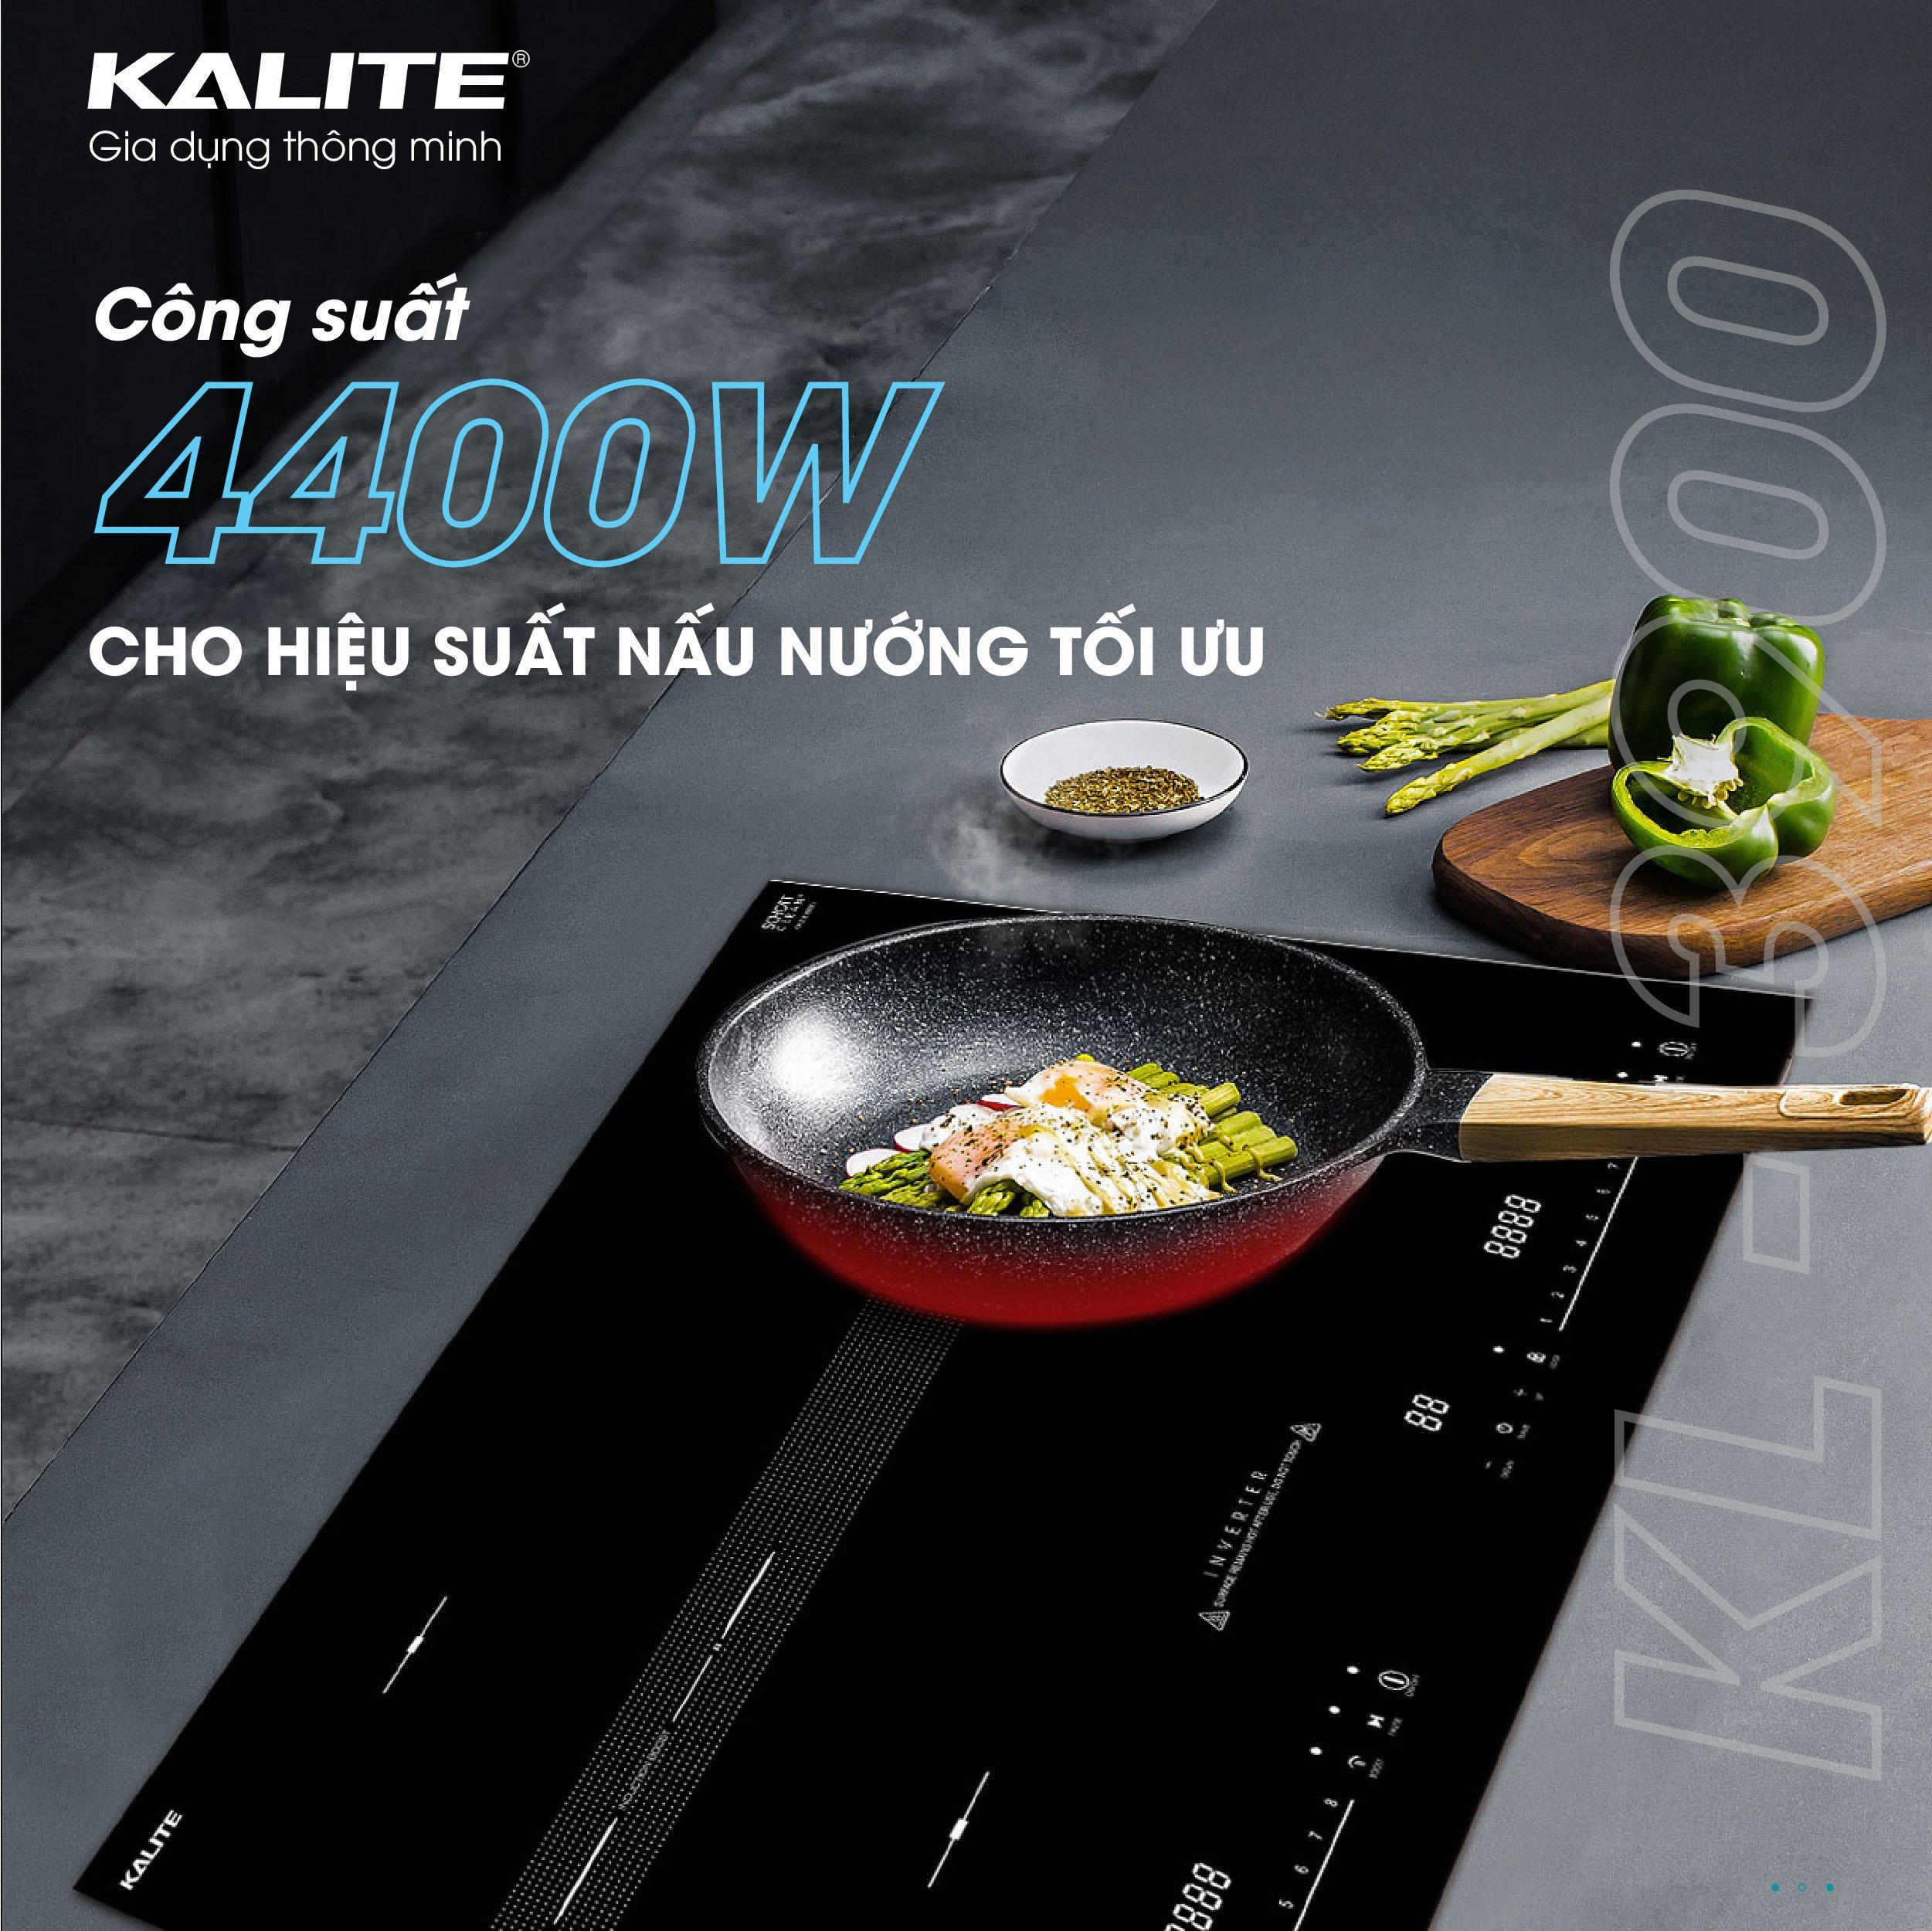 bep-tu-doi-kalite-3900-8